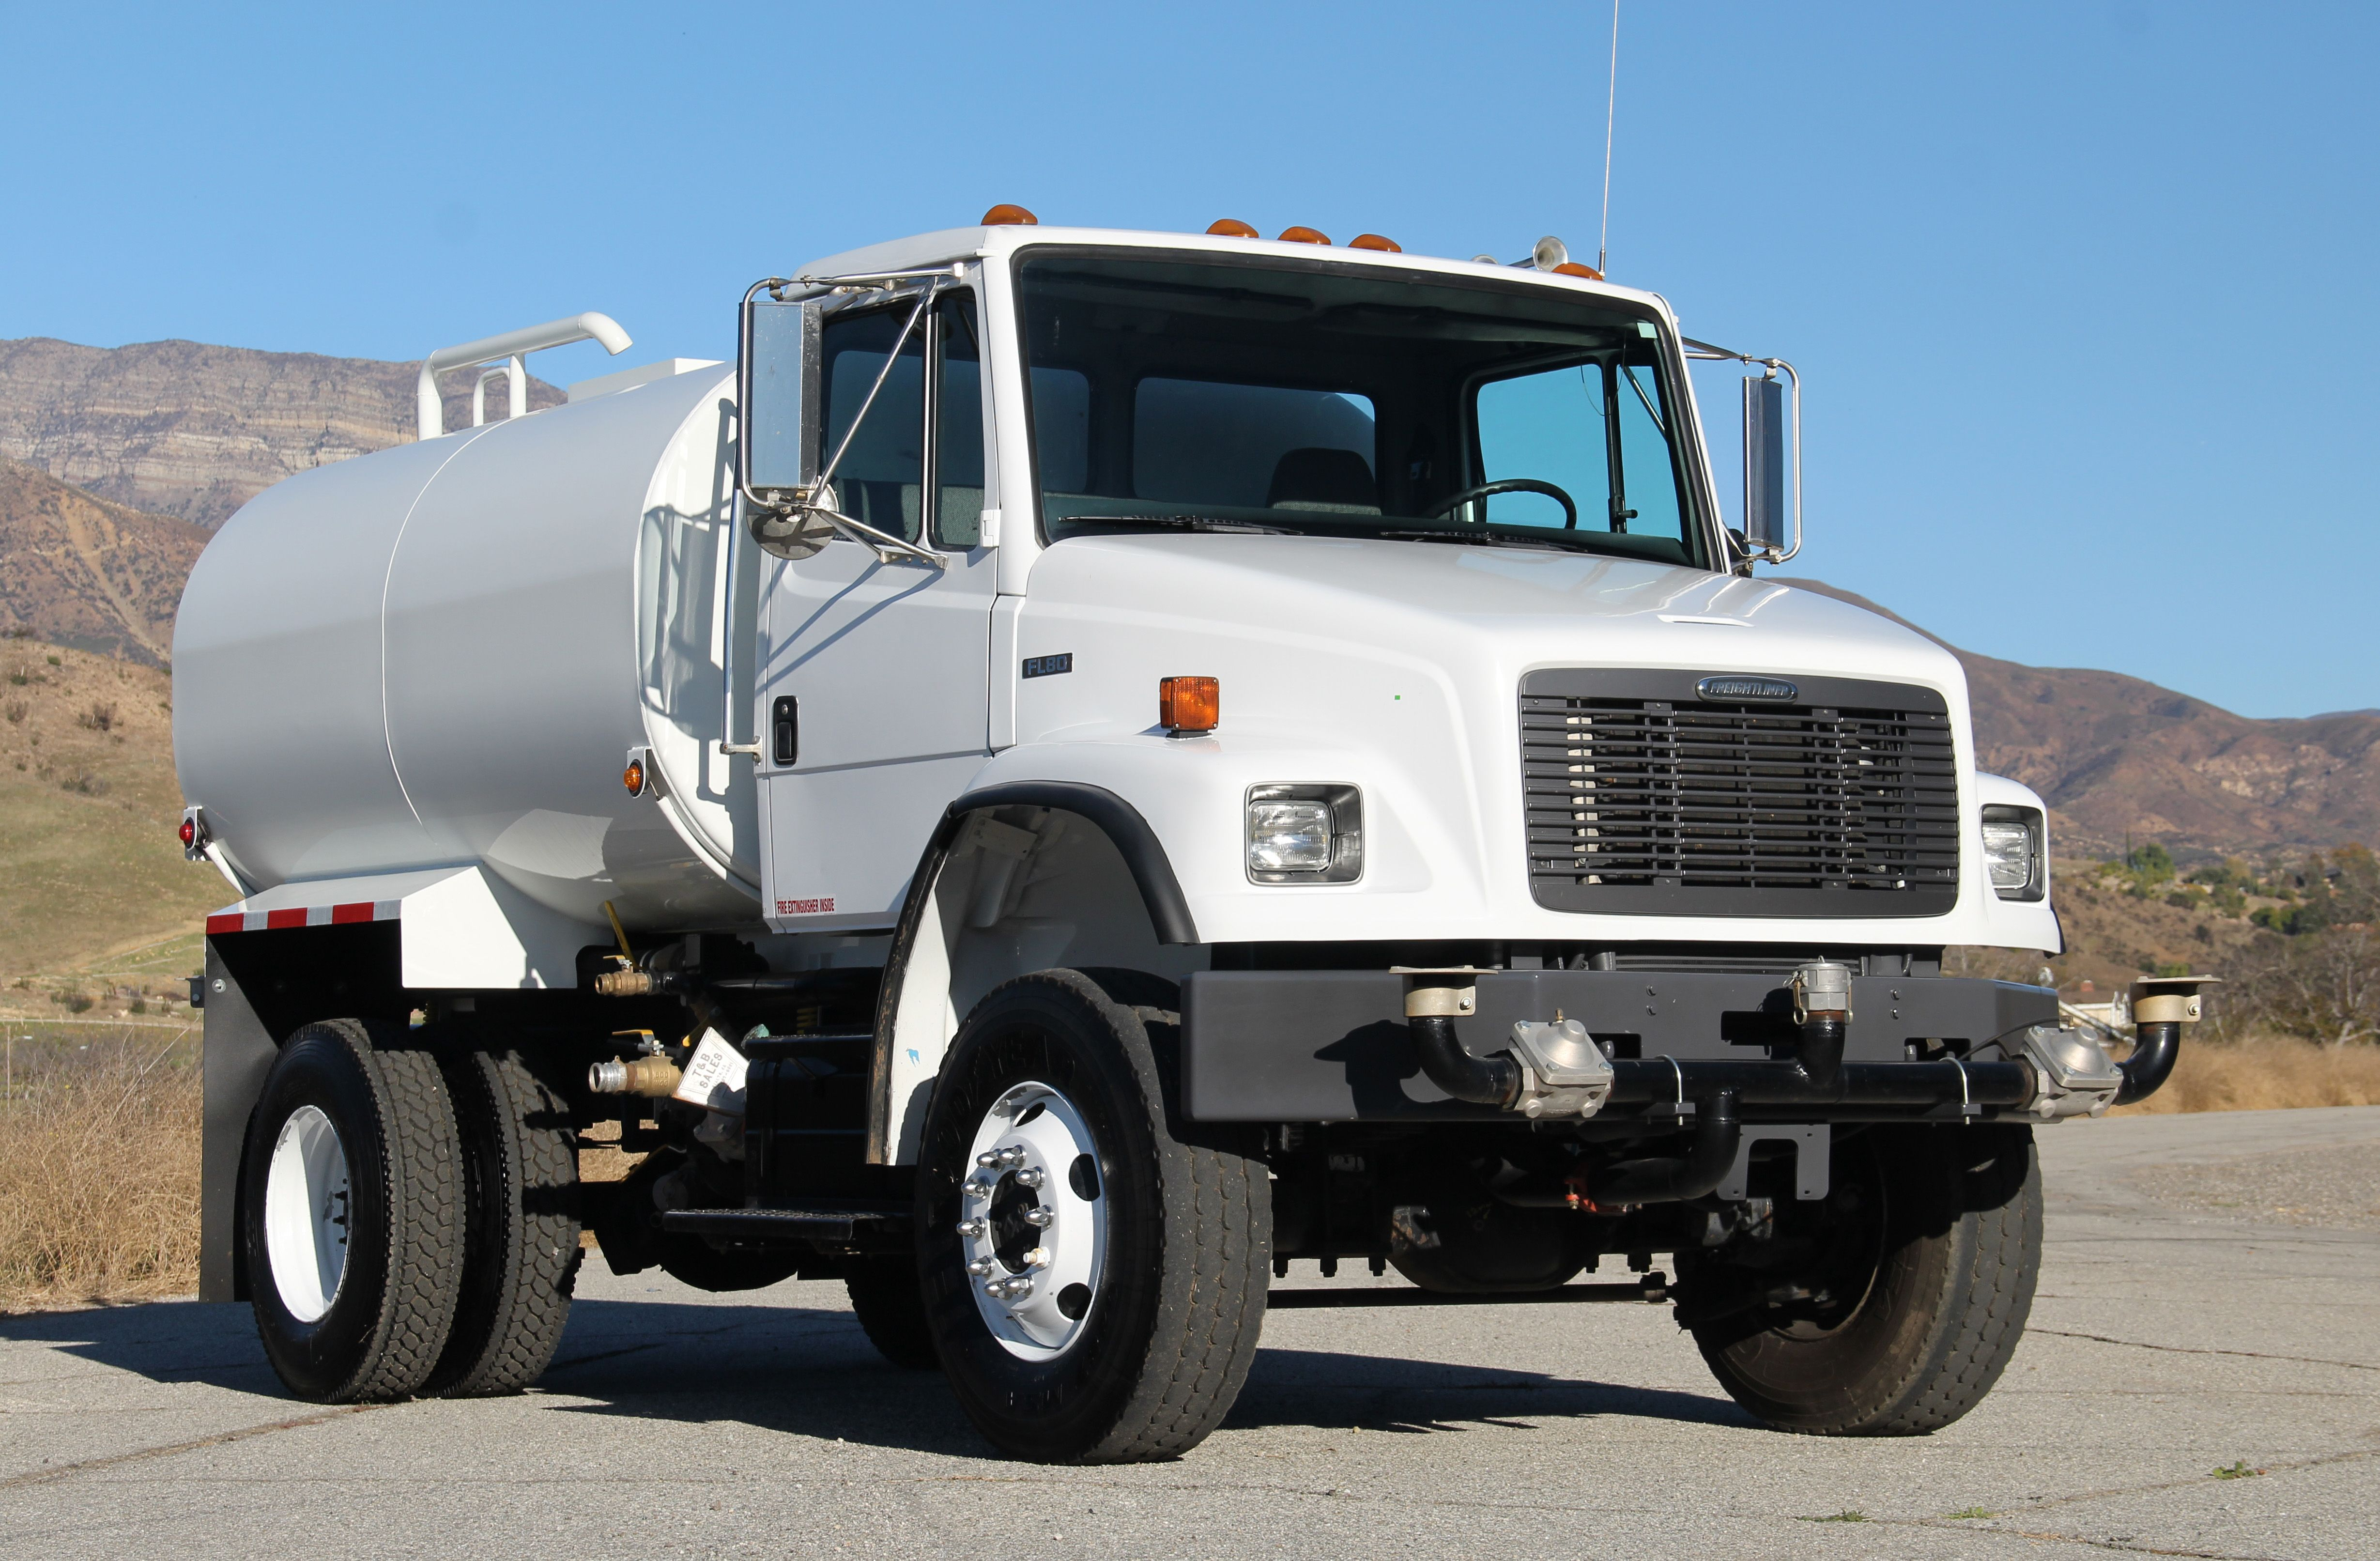 4x4 Water Truck Trucks Freightliner Heavy Equipment For Sale